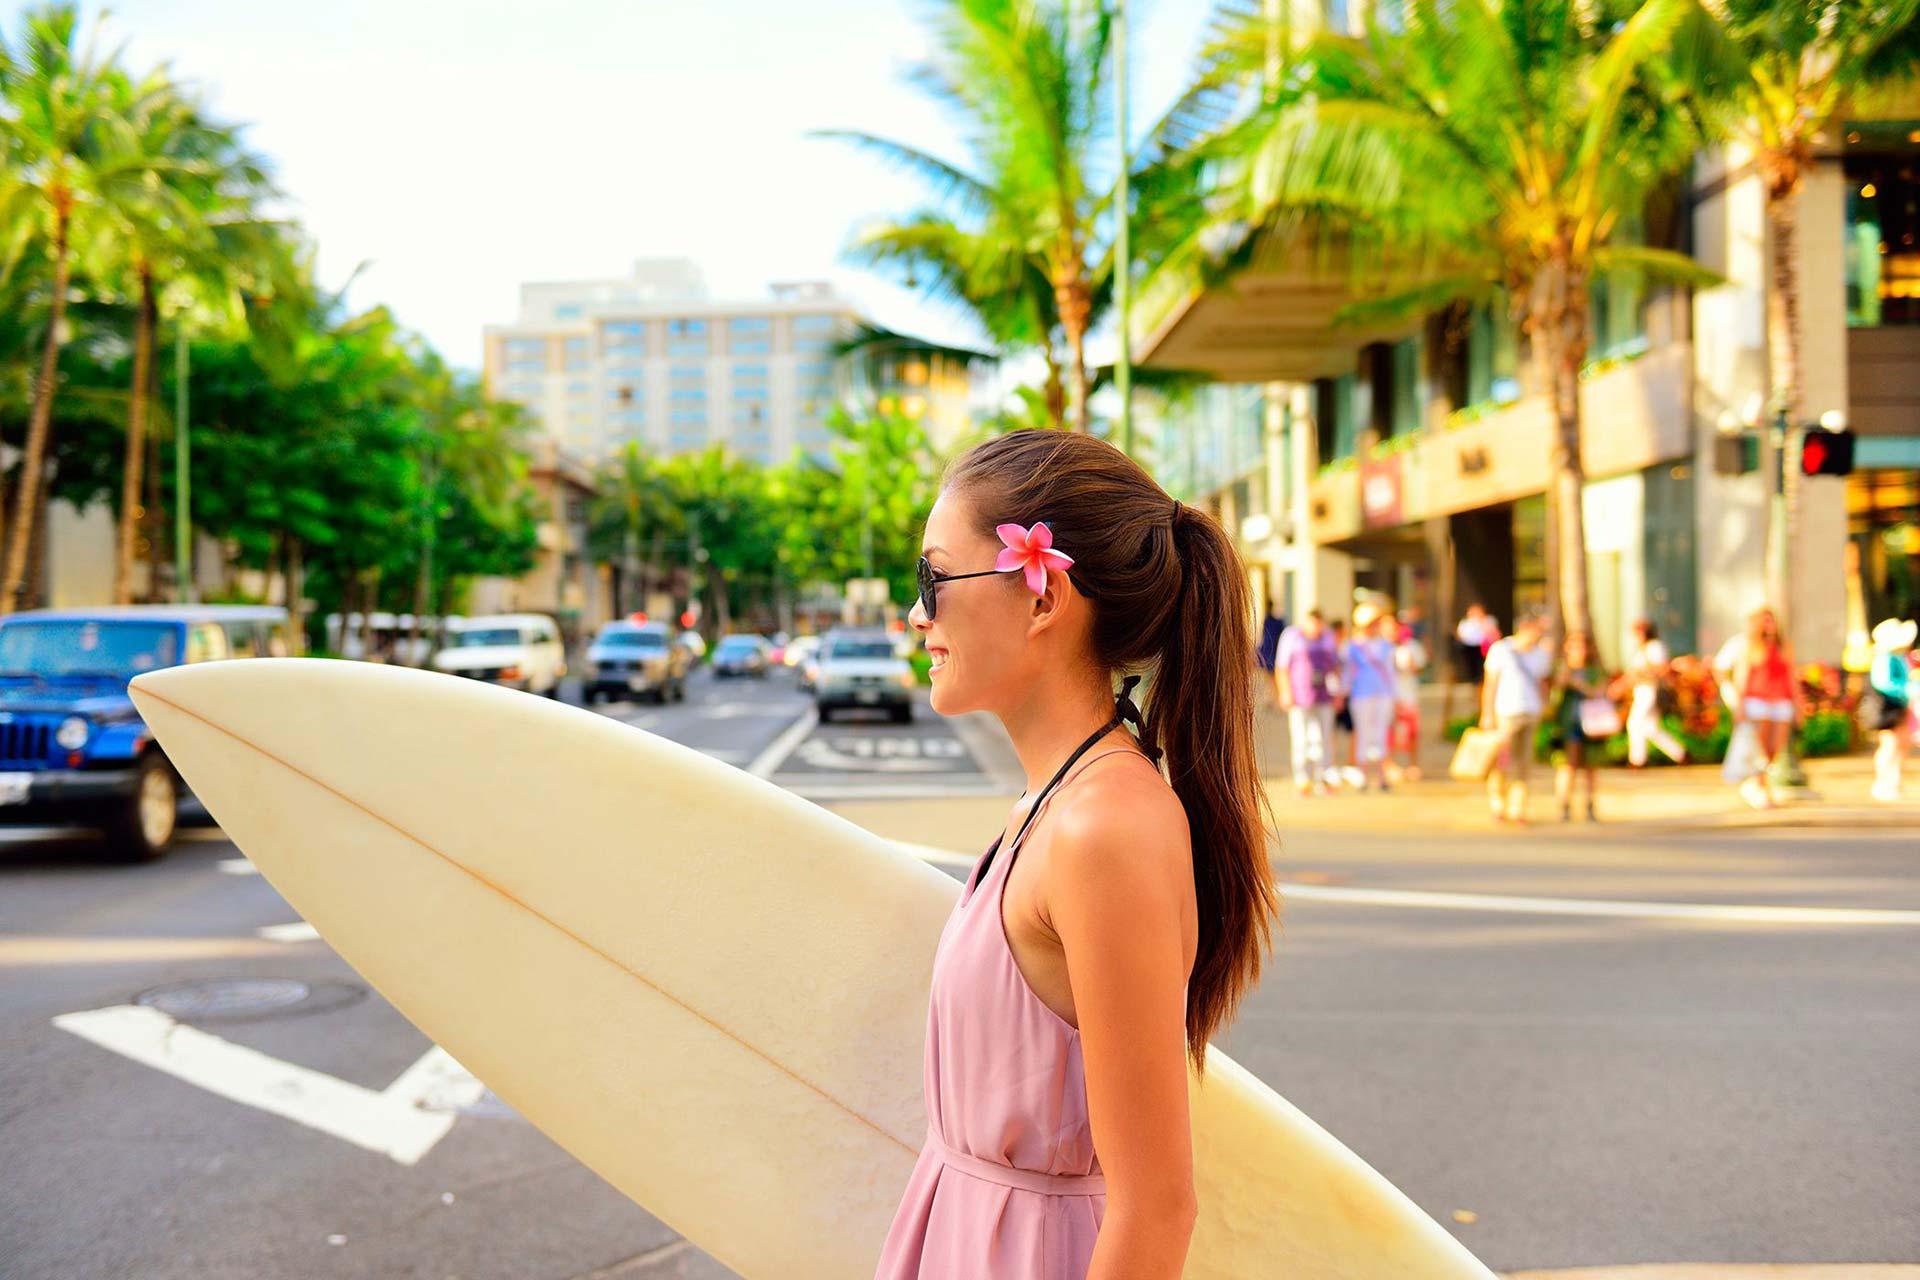 The-Royal-Hawaiian-Resort-Local-Attraction-Royal-Hawaiian-Center-Surfer